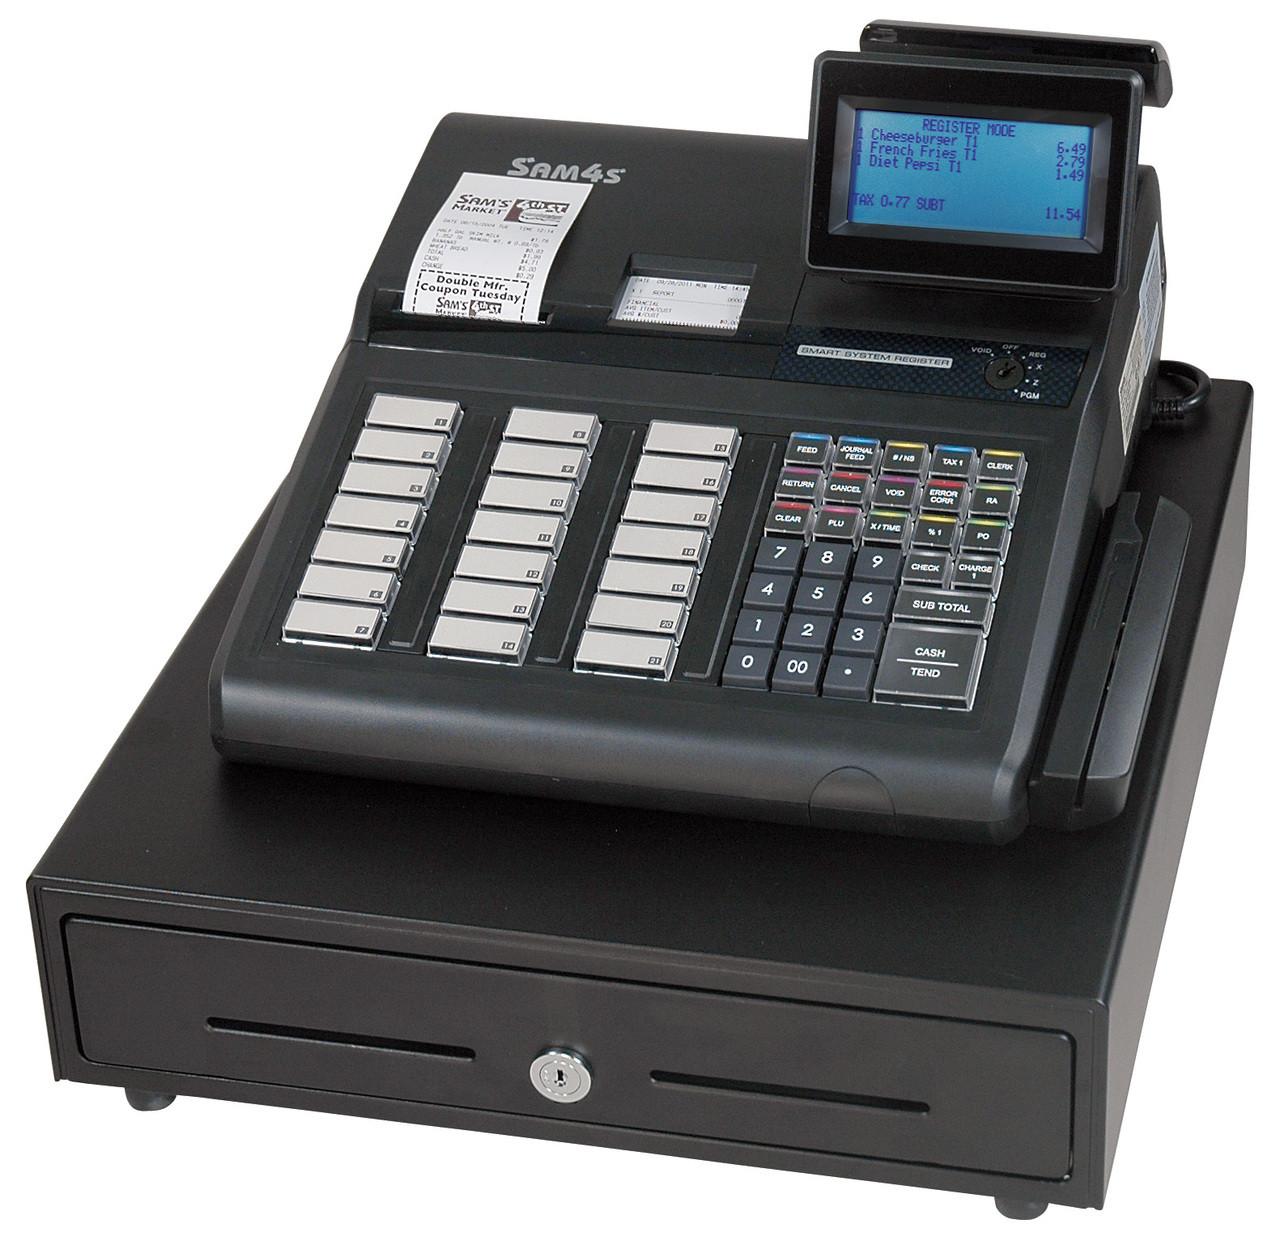 SAM4s SPS-345 Retail Cash Register *Shown with Optional MSR*